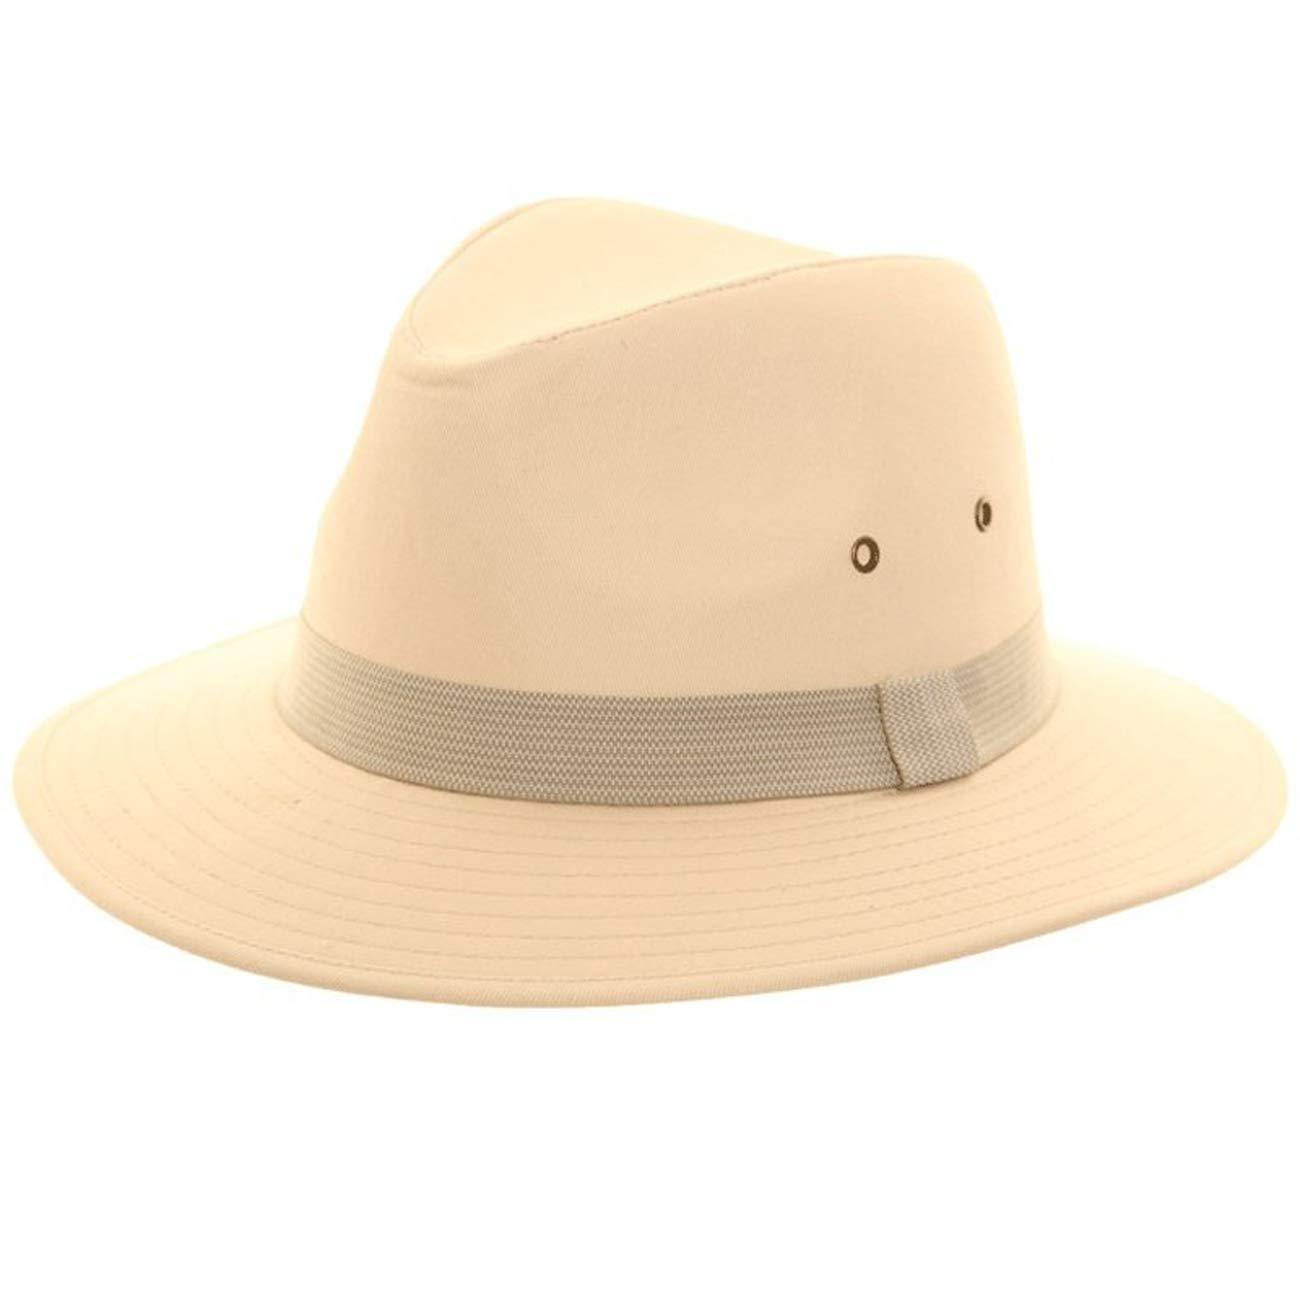 The Hat Company Mens Cotton Fedora